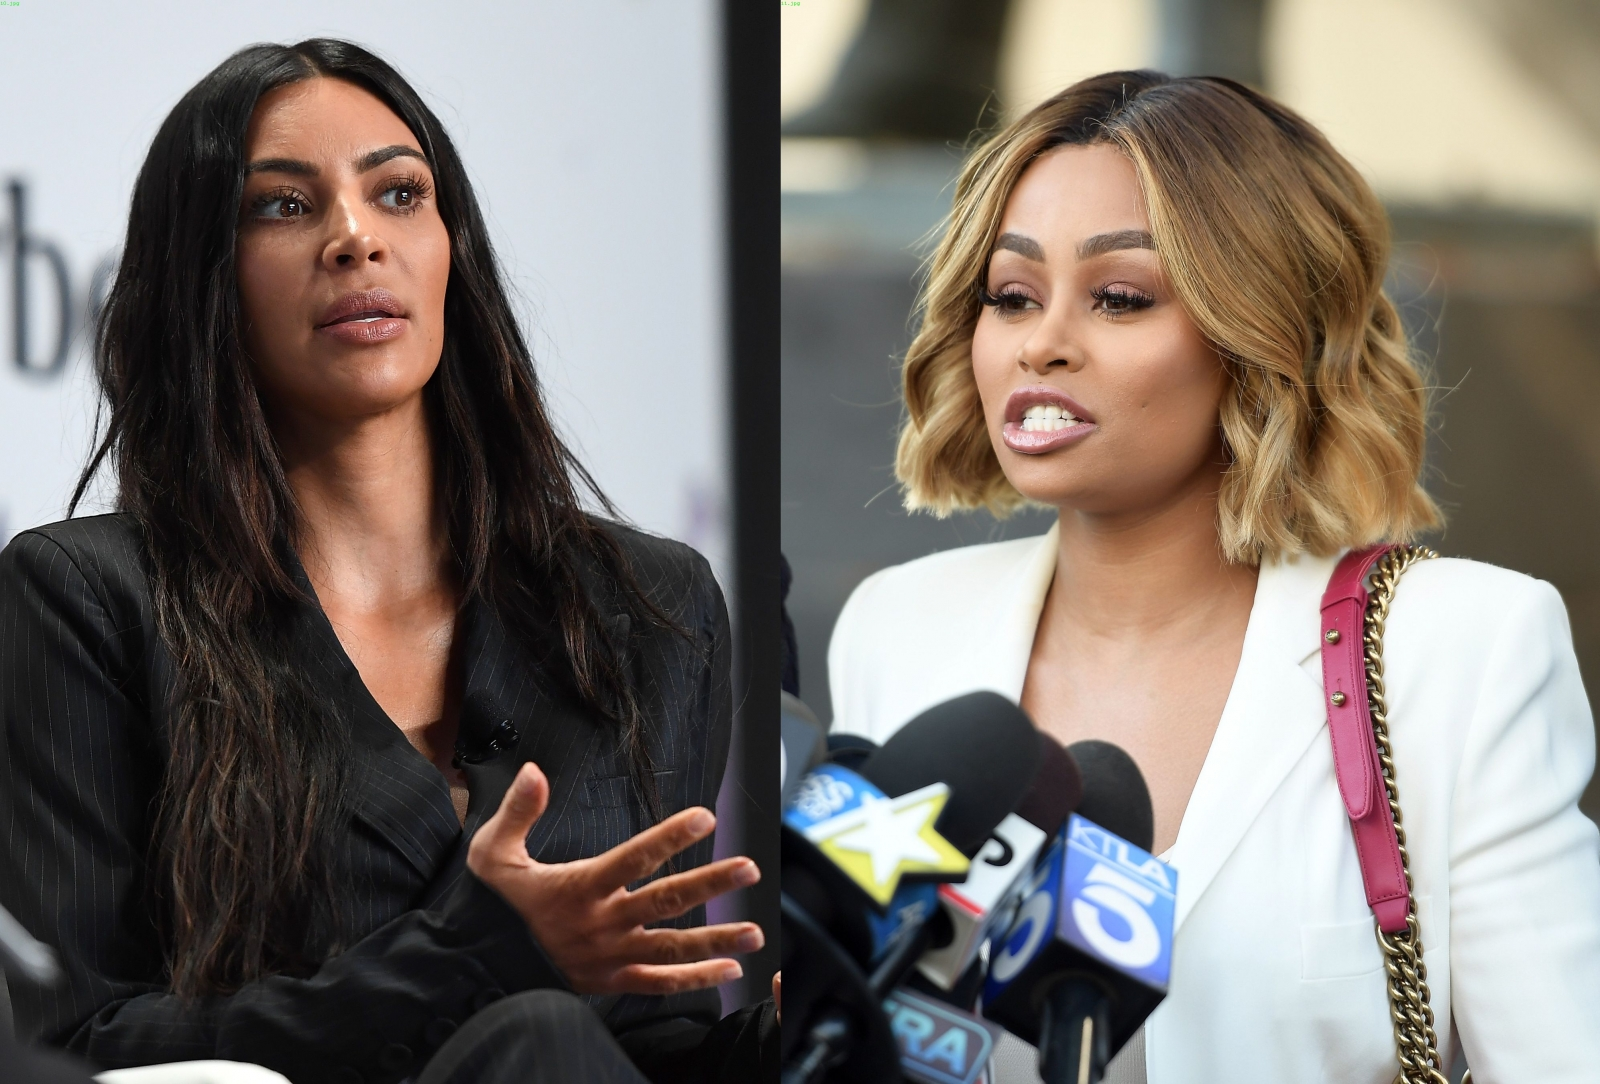 Kim Kardashian and Blac Chyna